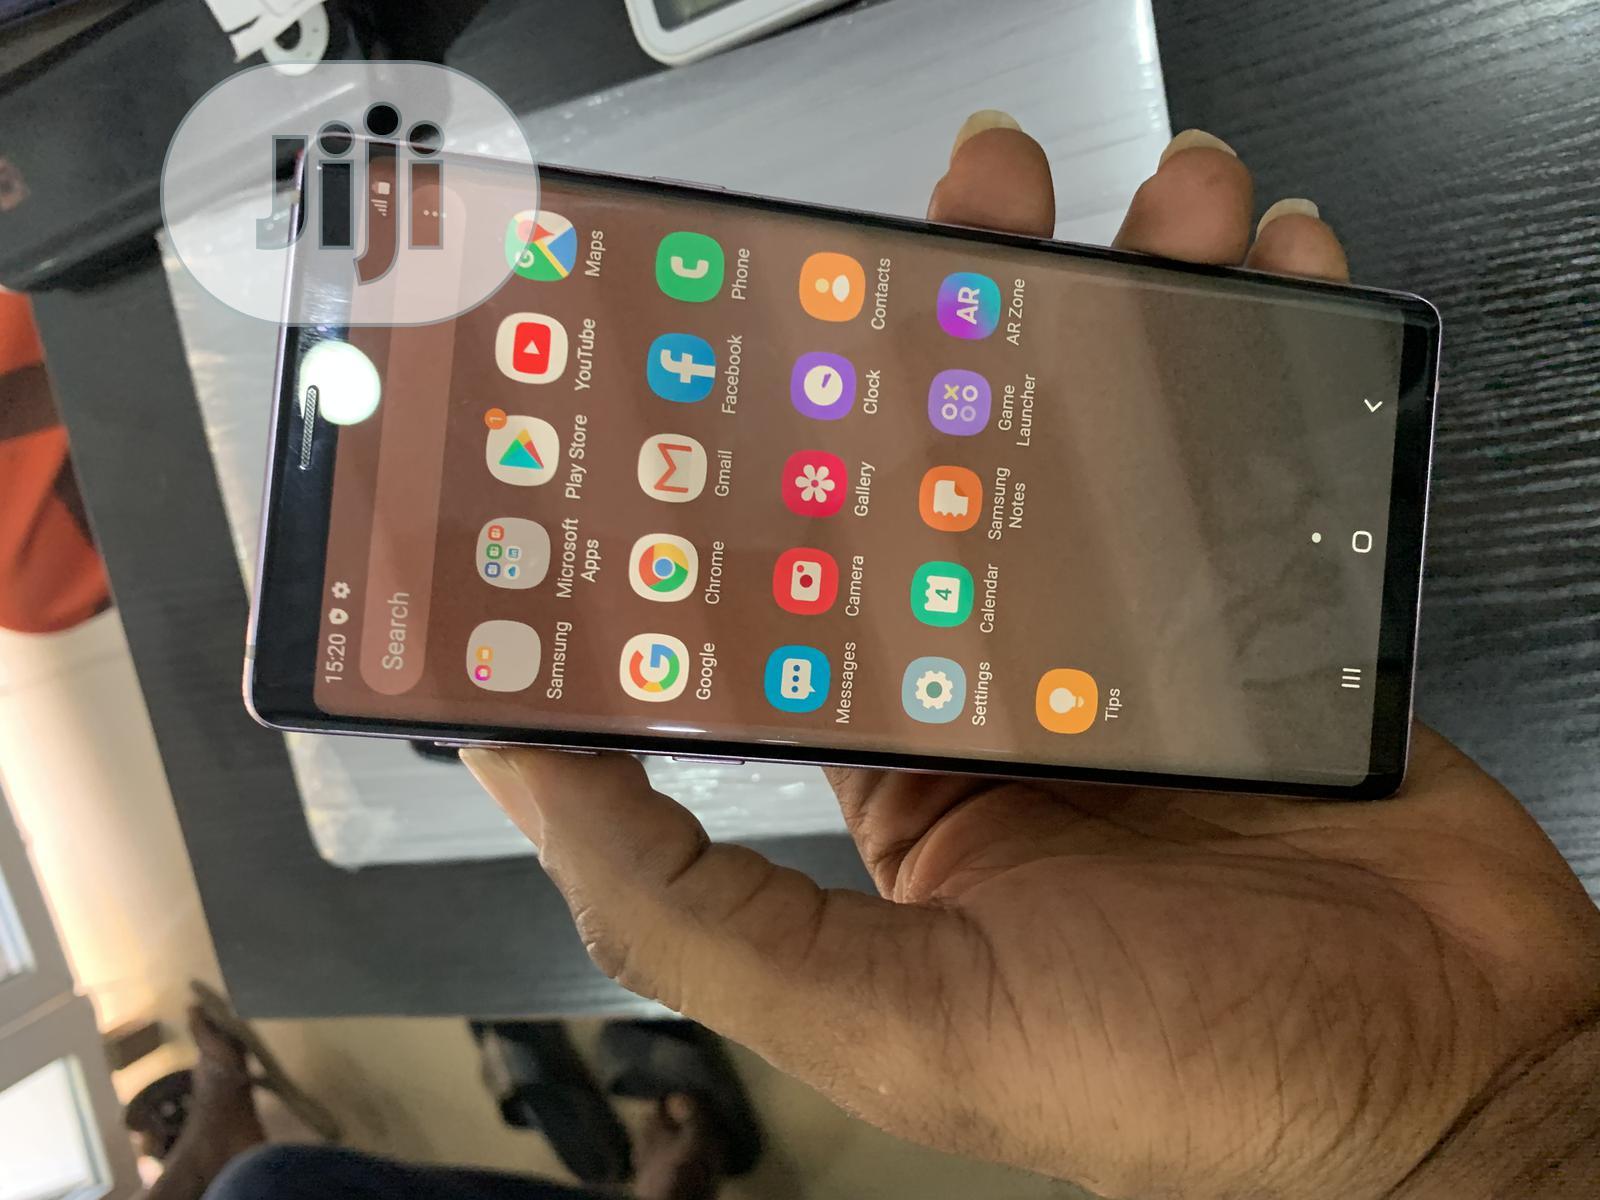 Samsung Galaxy Note 9 128 GB | Mobile Phones for sale in Benin City, Edo State, Nigeria